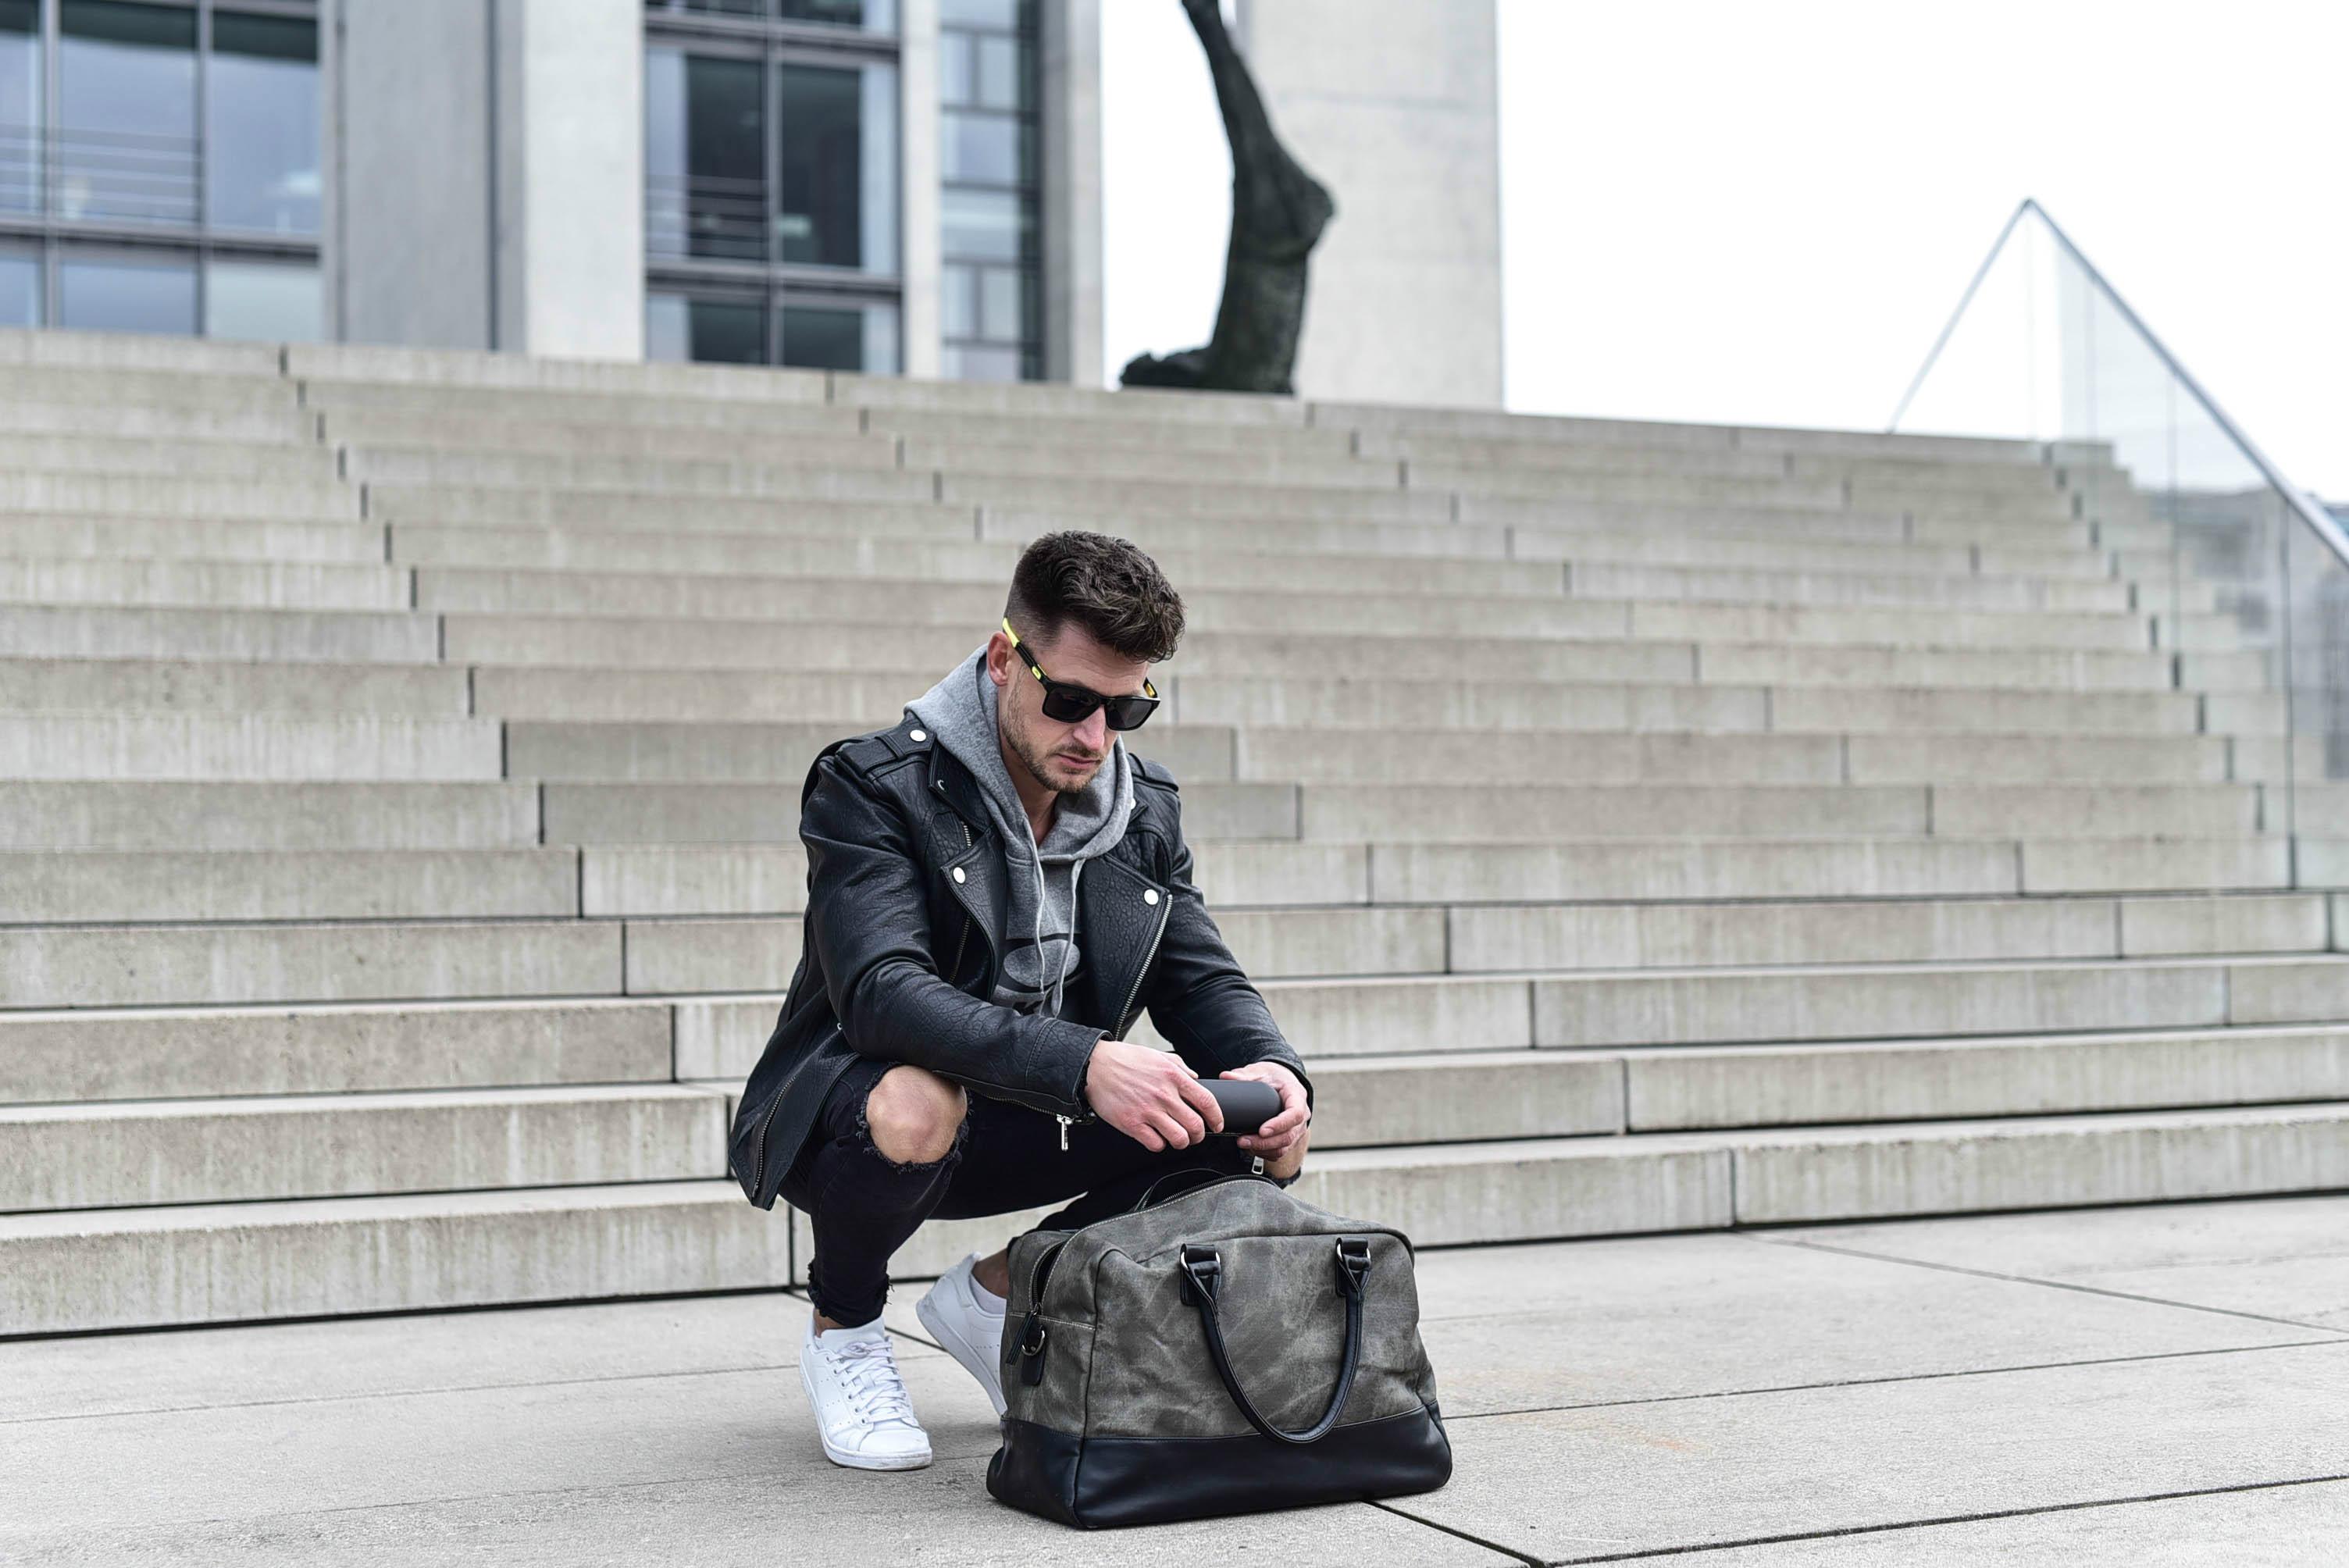 Tommeezjerry-Styleblog-Männerblog-Männer-Modeblog-Berlin-Berlinblog-Männermodeblog-Outfit-Sport-Oakley-Brillen-Glasses-Mister-Spex-Sportlook-Casual-Look